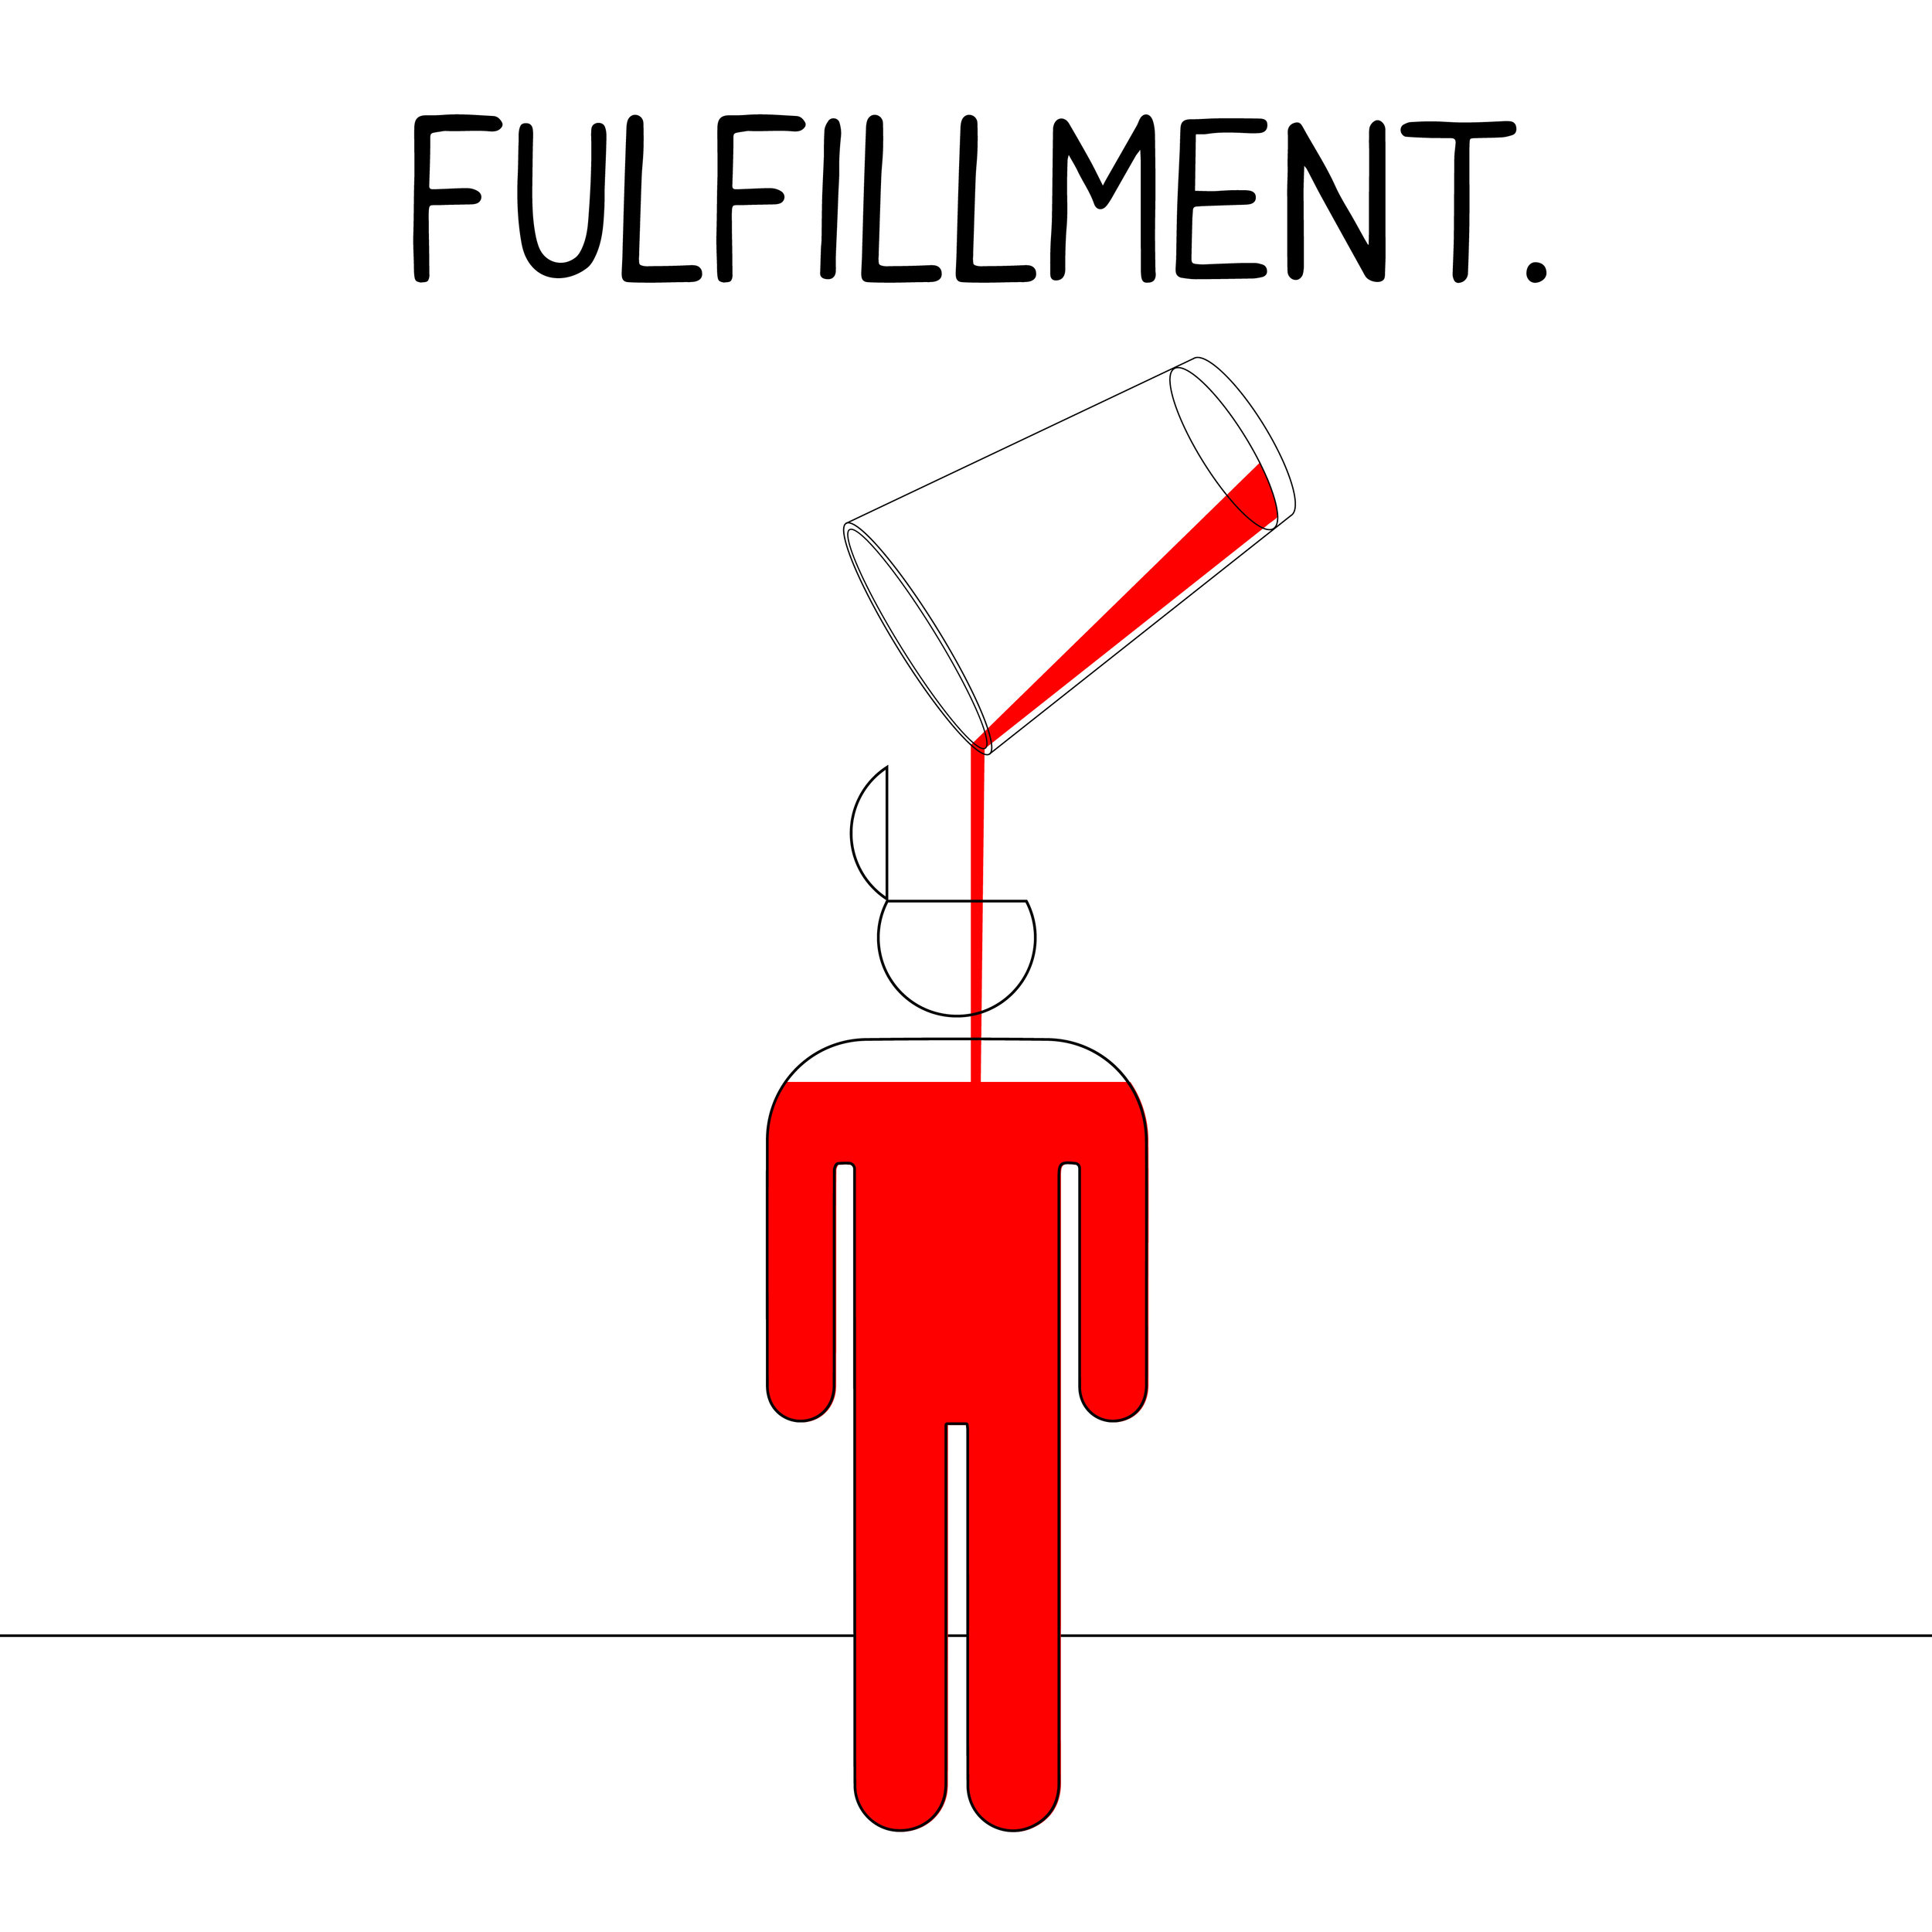 fulfillment-01.jpg